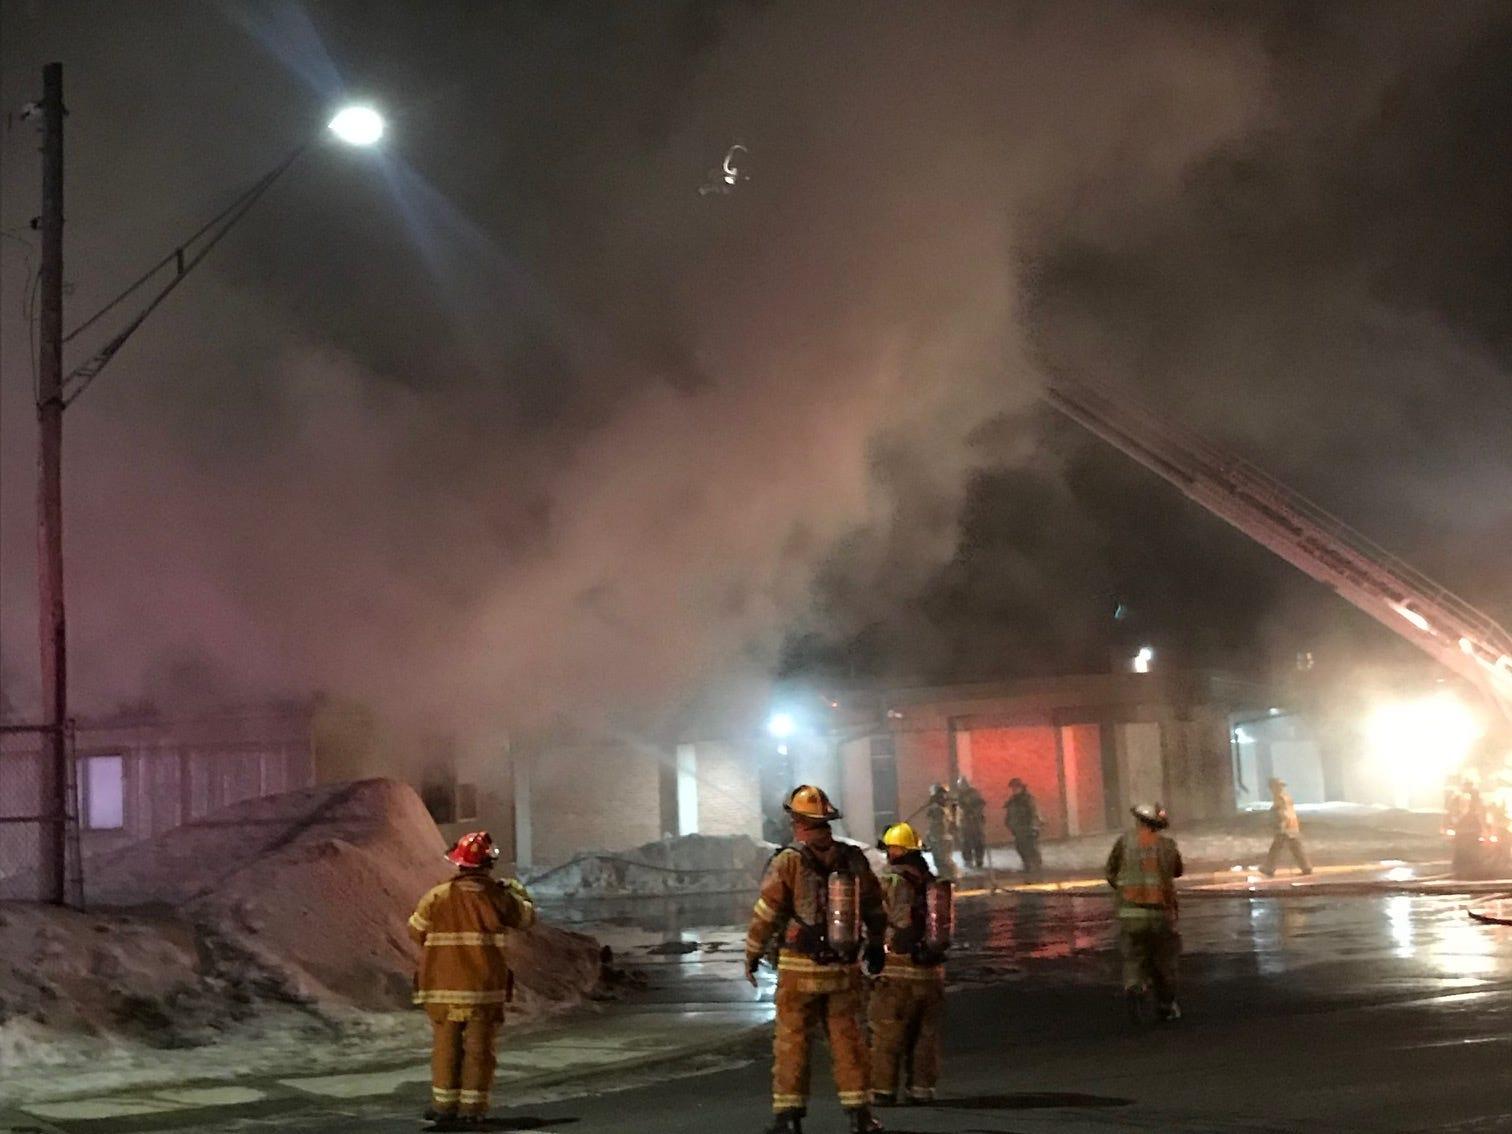 Sauk Rapids fire crews Sunday night battled a blaze at Plesantview Elementary School.